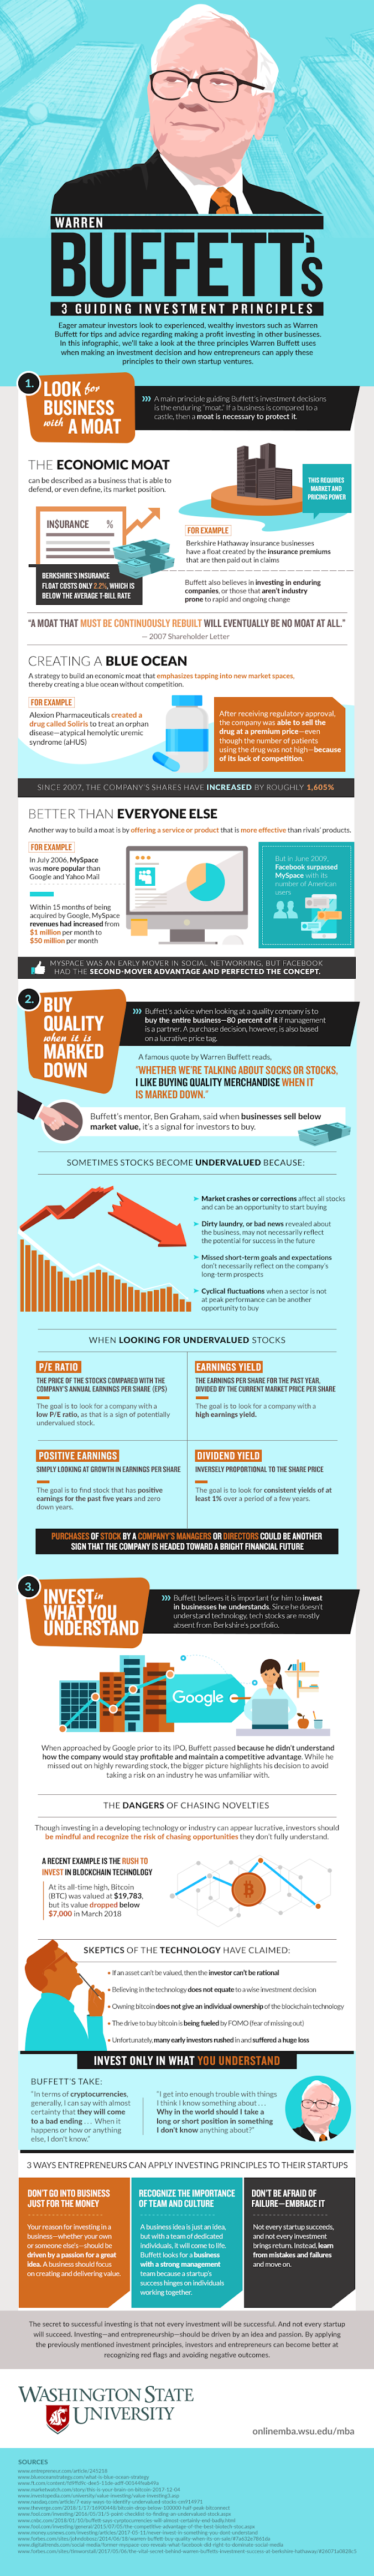 Warren Buffett's 3 Guiding Investment Principles #infographic